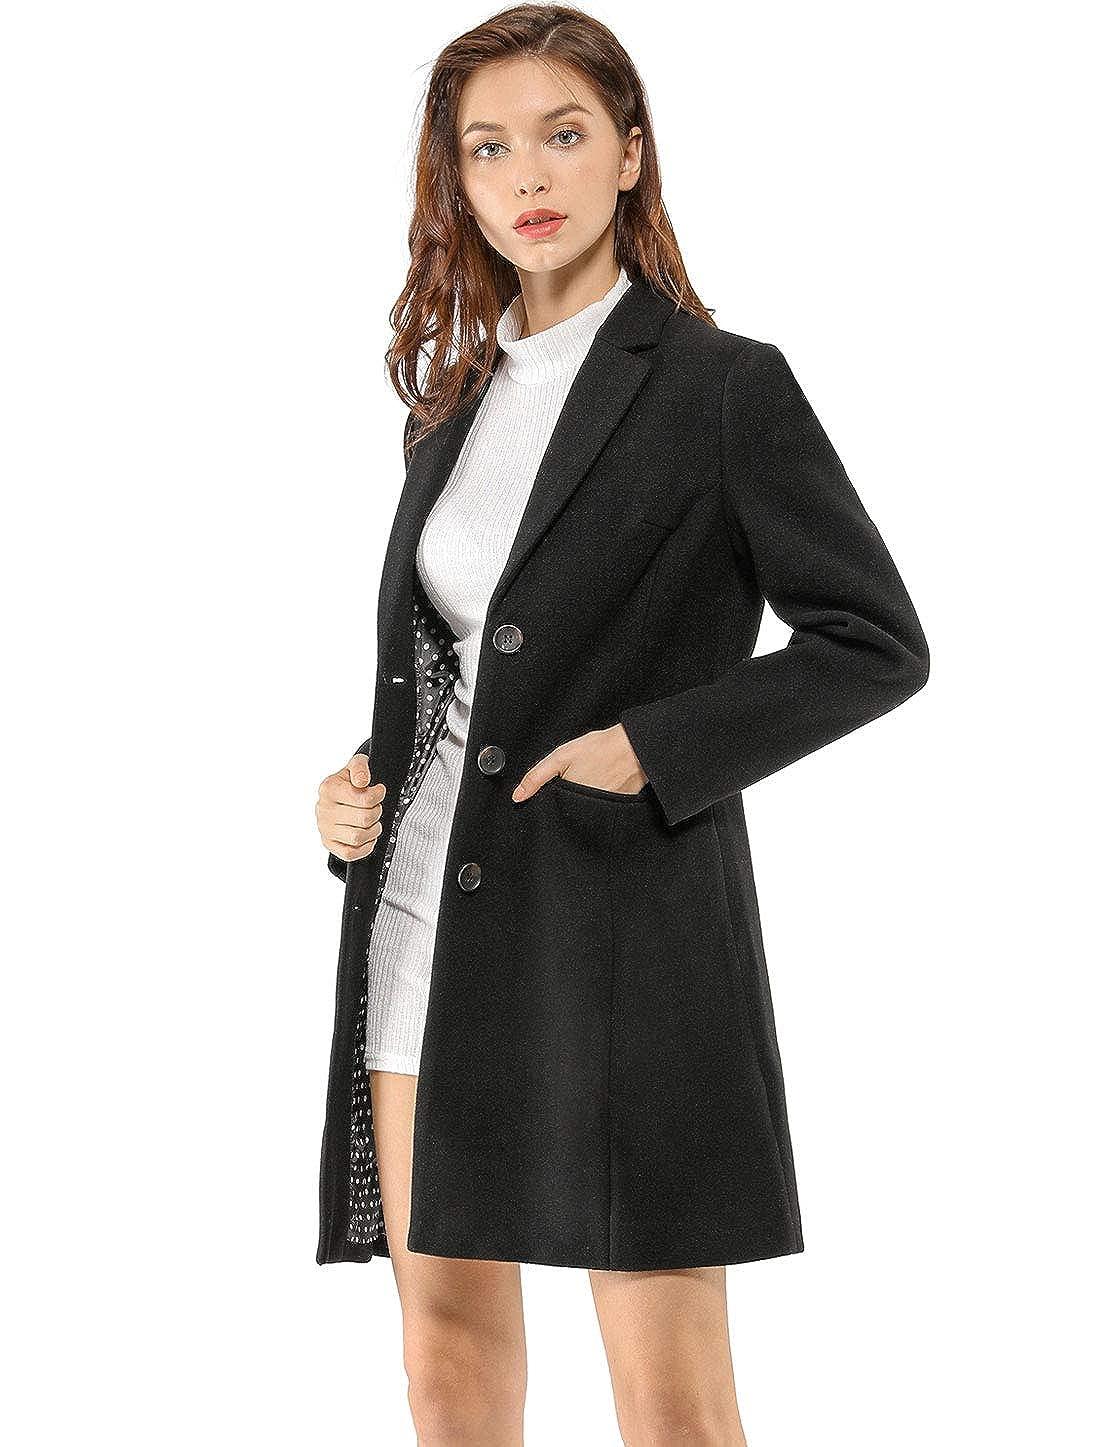 Allegra K Womens Notched Lapel Single Breasted Outwear Winter Coat